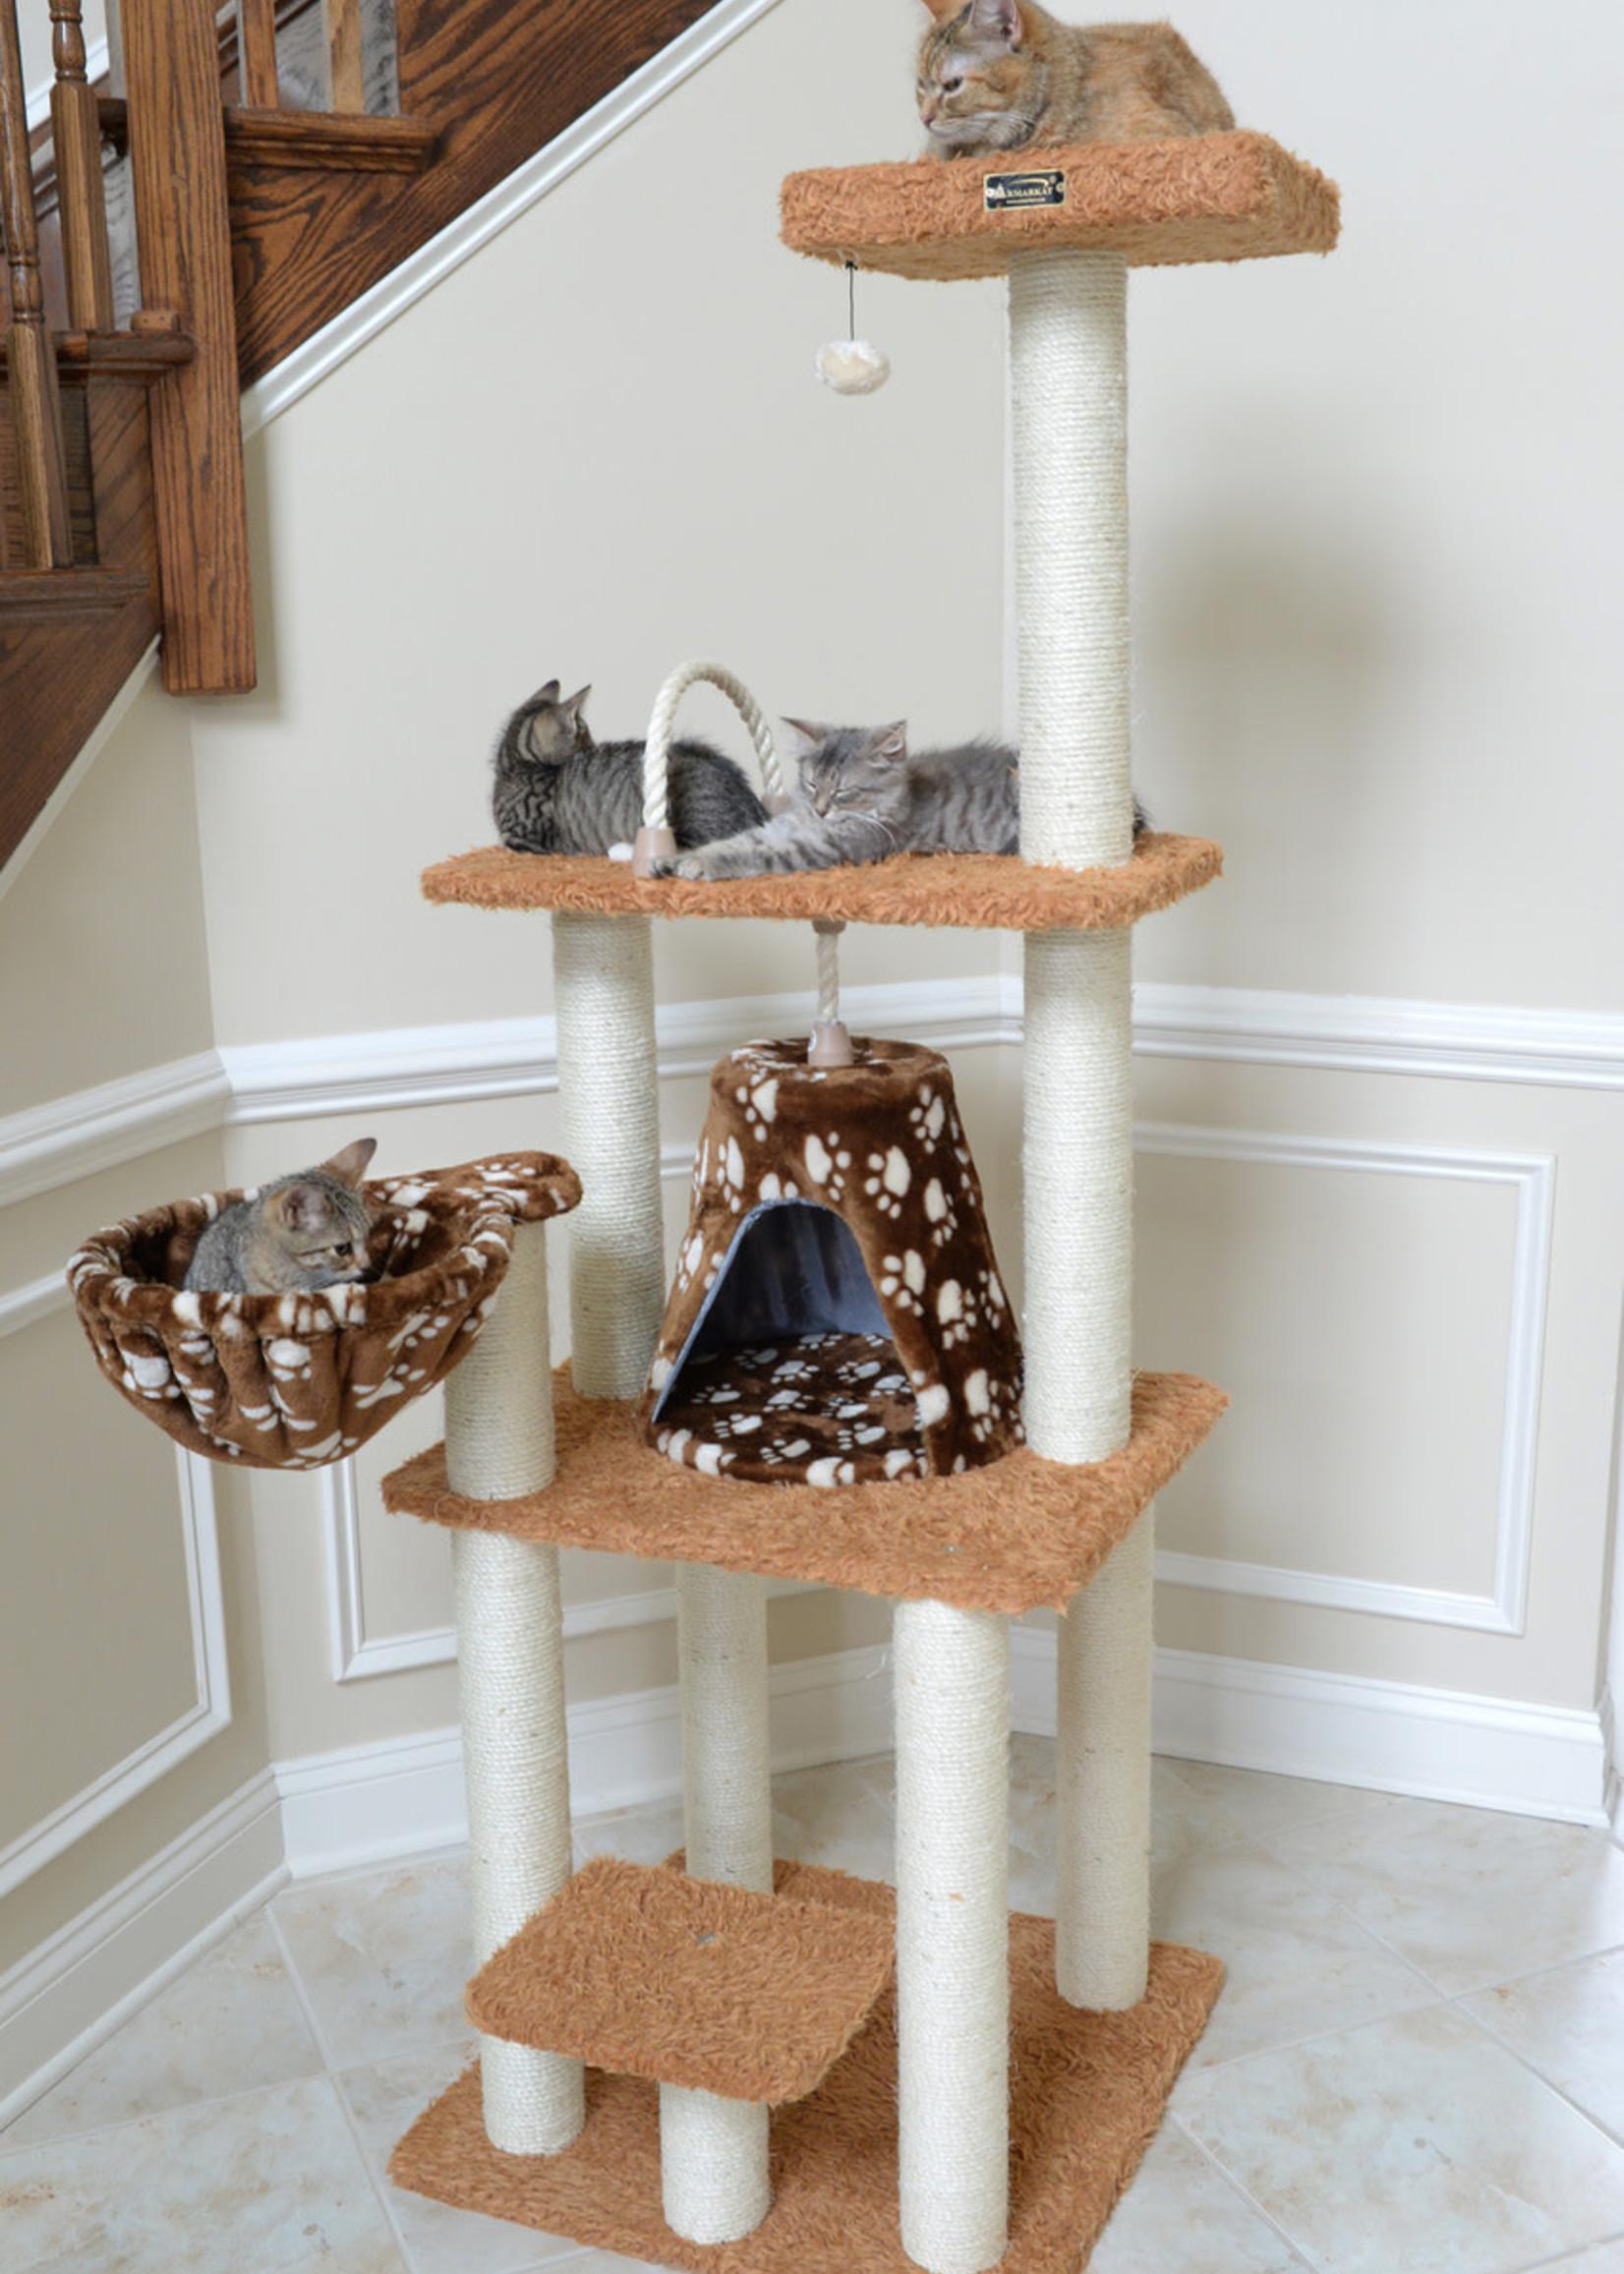 Armarkat Armarkat Brown Carpet Cat Furniture Pressed Wood Kitty Tower